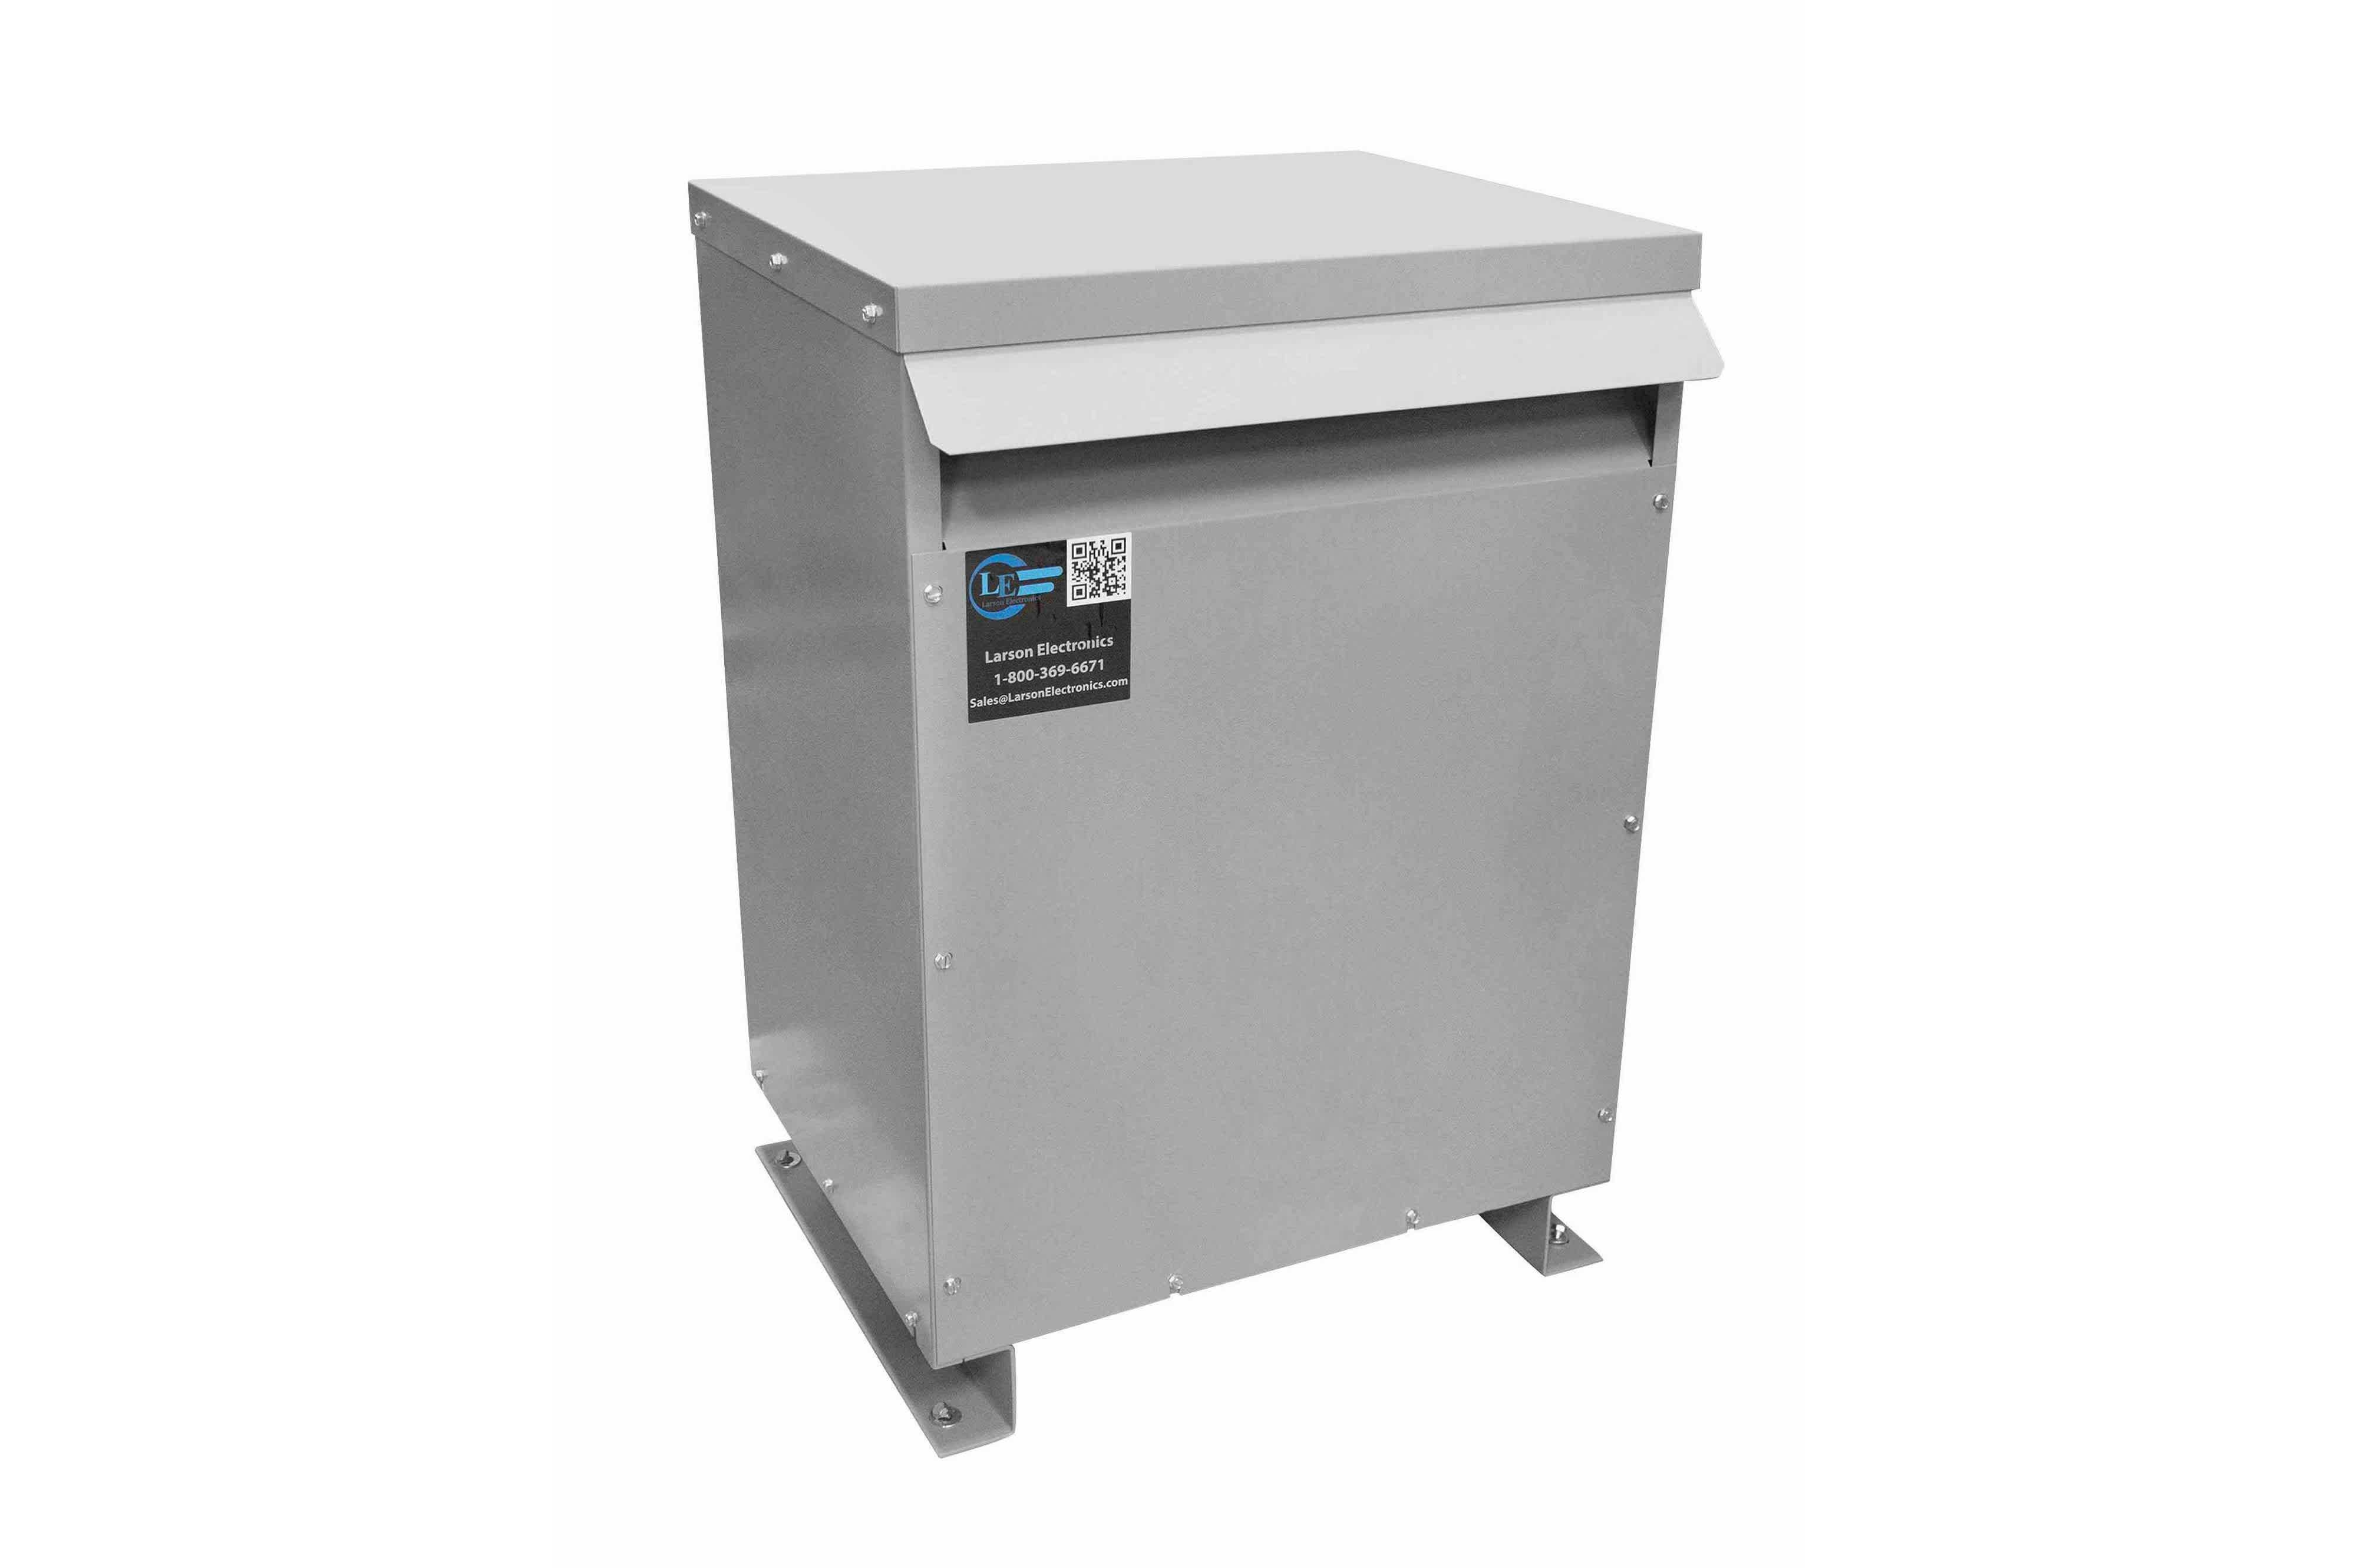 175 kVA 3PH Isolation Transformer, 600V Wye Primary, 480Y/277 Wye-N Secondary, N3R, Ventilated, 60 Hz